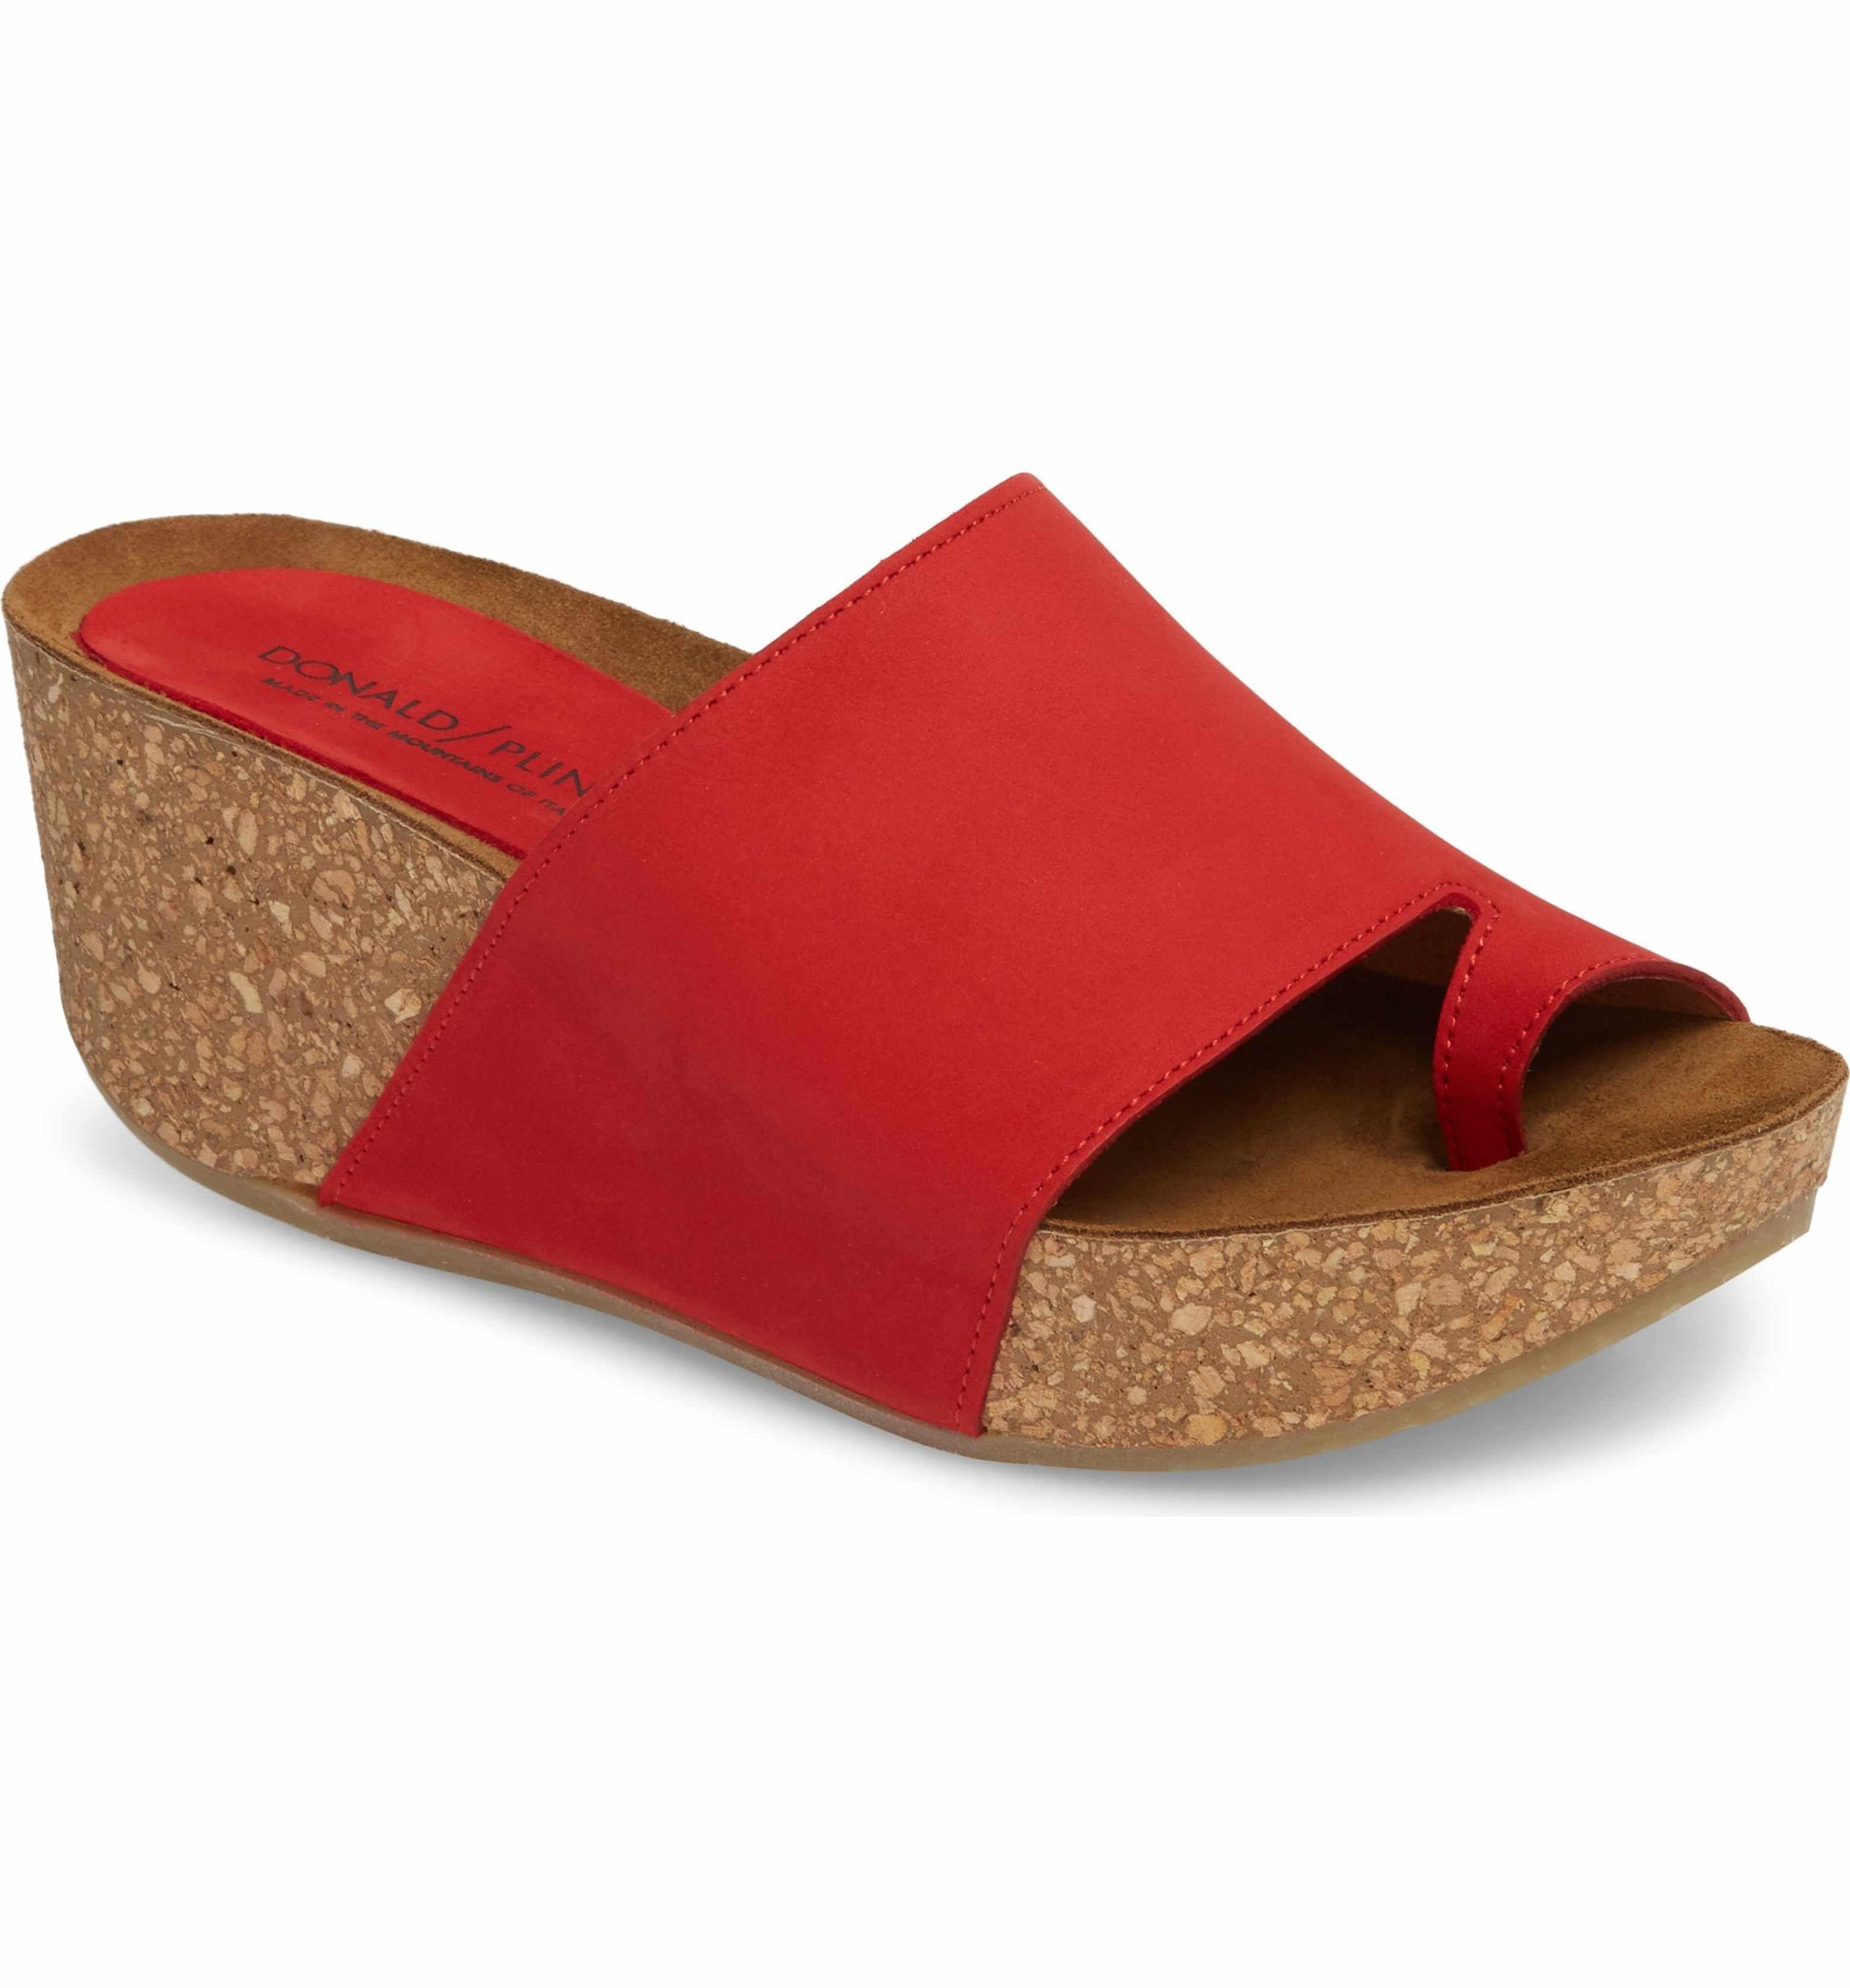 4d6ce12aa08b Donald J Pliner Ginie Platform Wedge Sandal. Listed as having 2-1 2